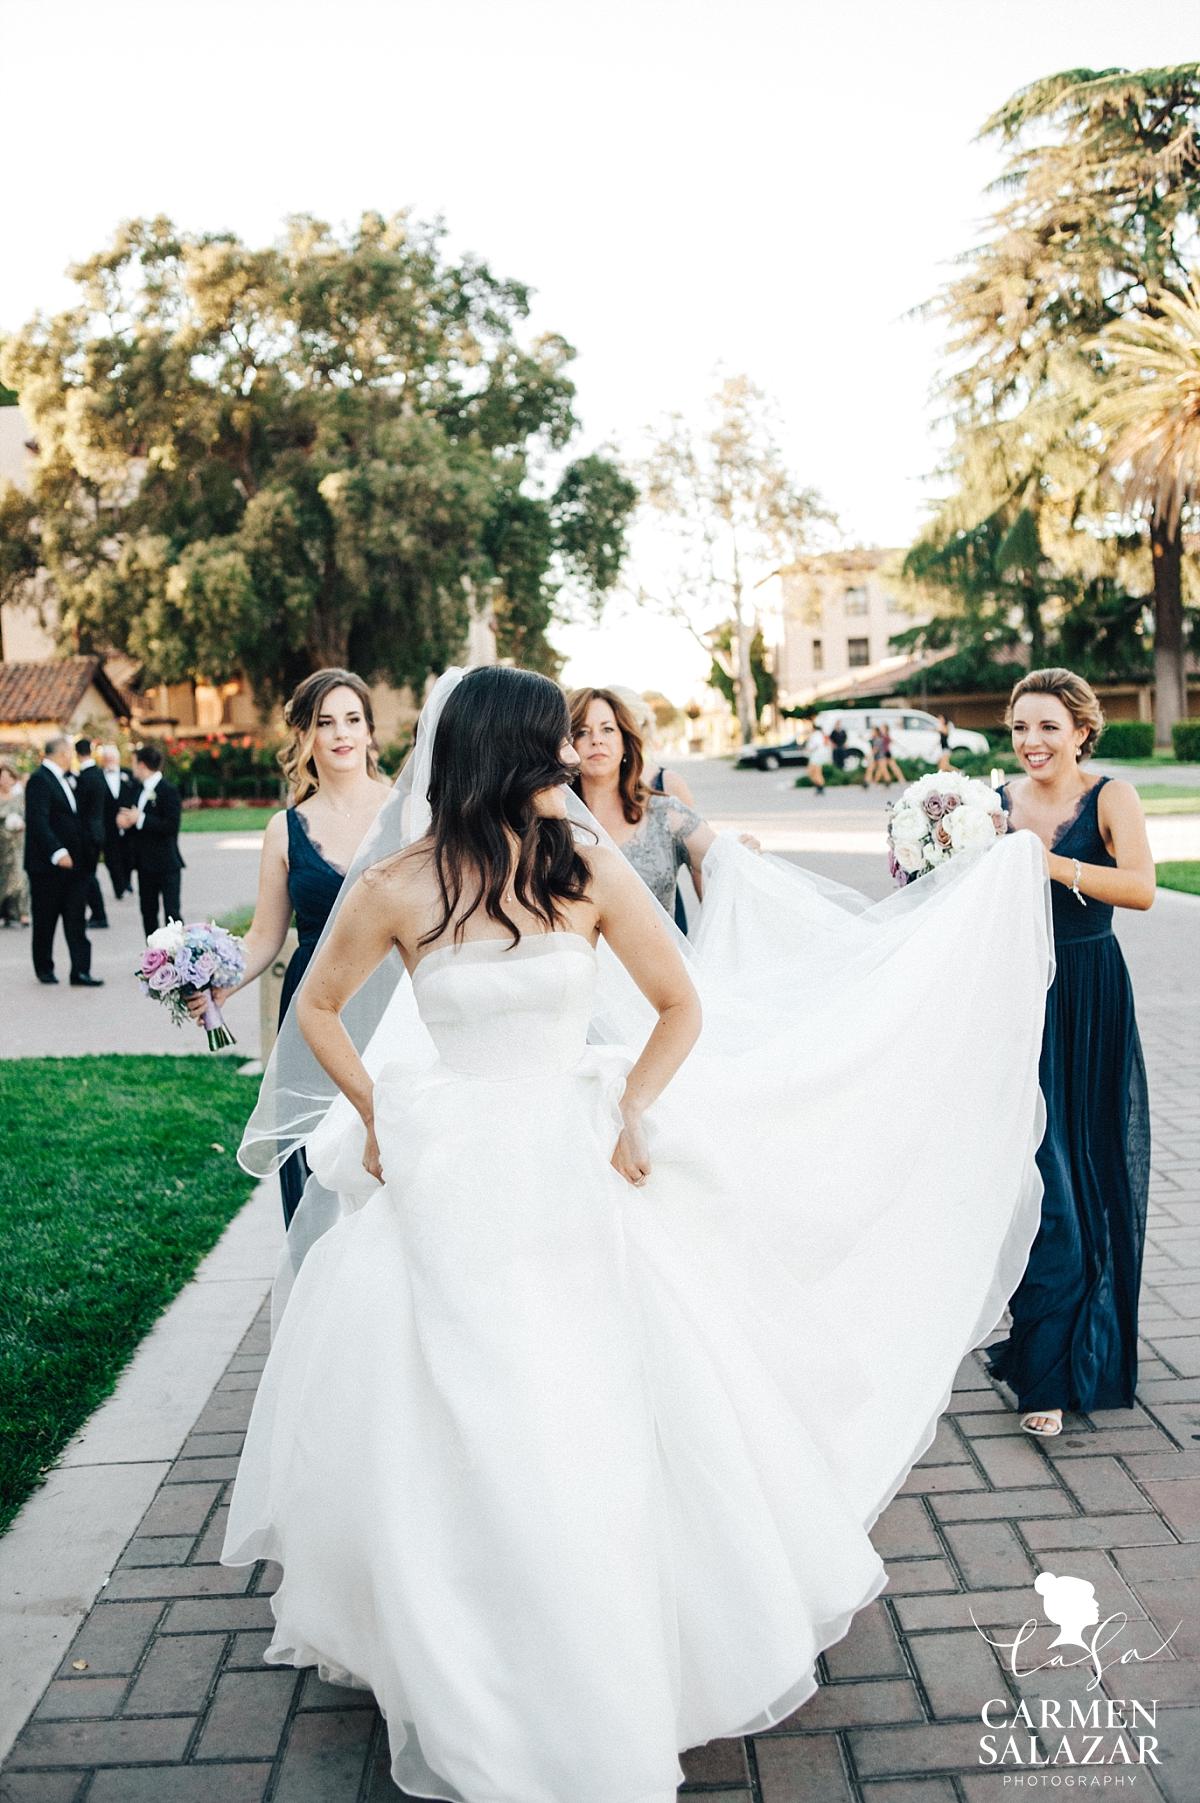 Gorgeous princess gown walking to reception - Carmen Salazar